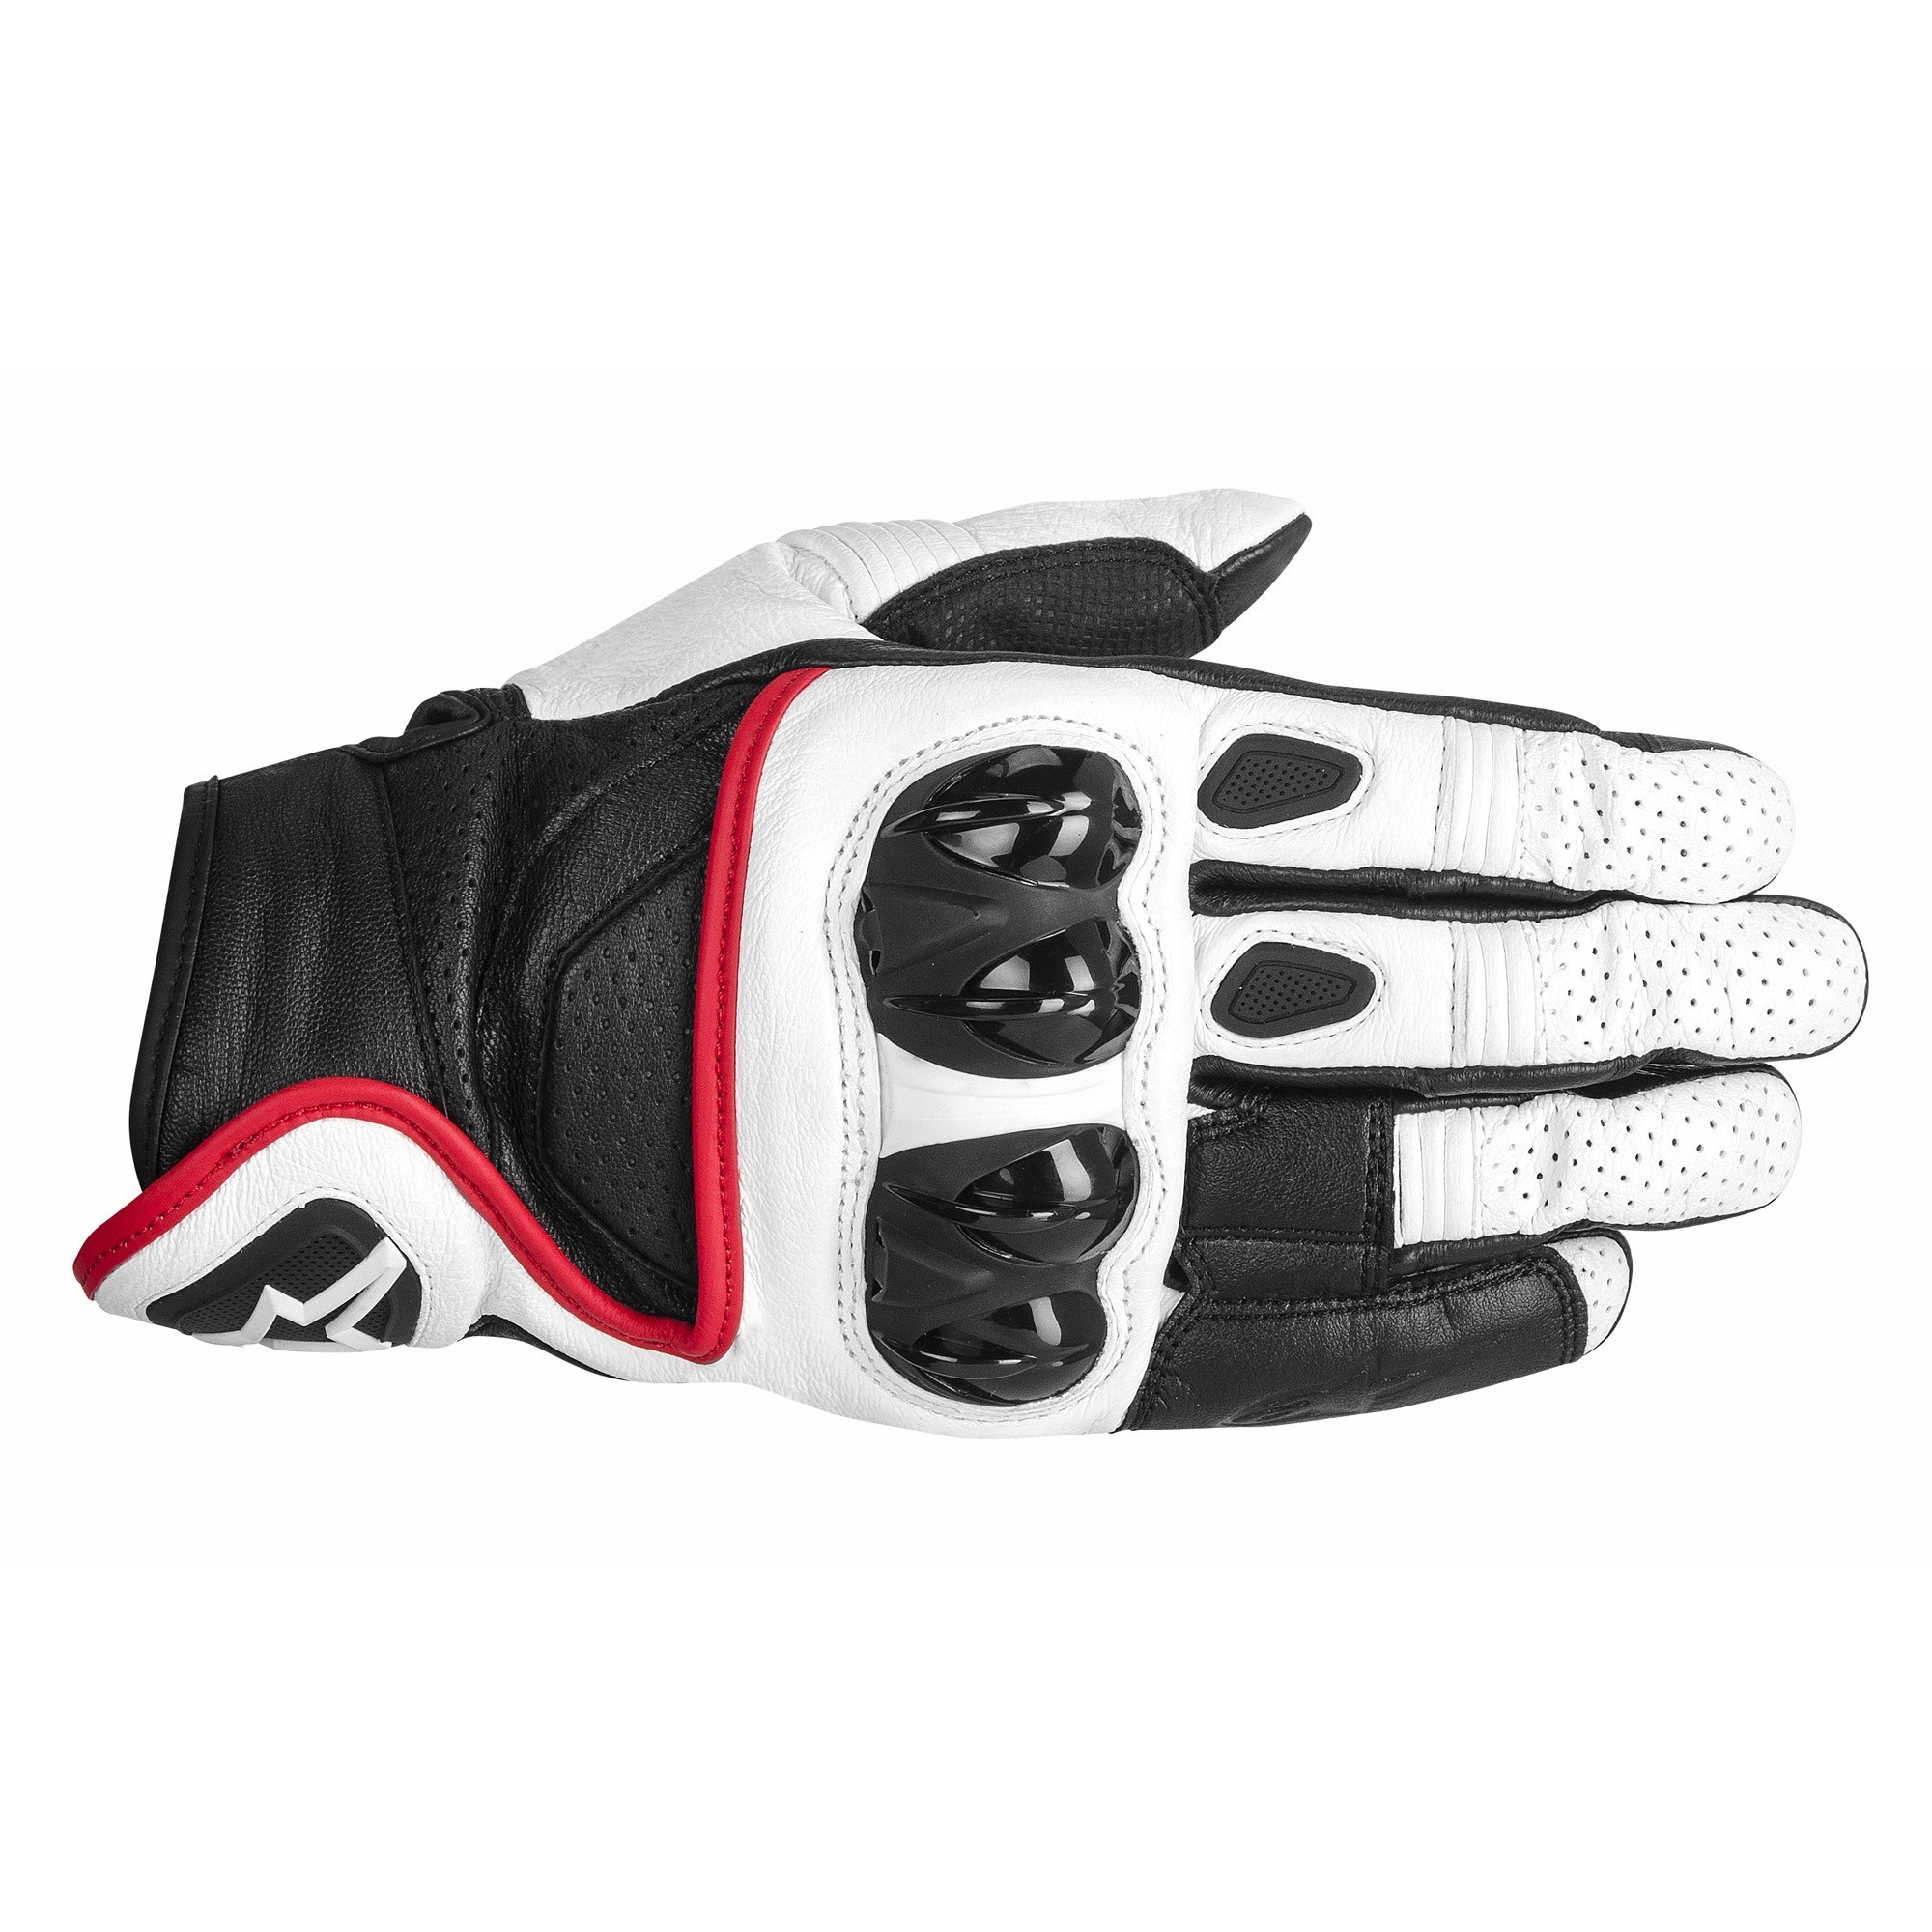 Alpinestars Celer Glove Zwart/Wit/Rood / Sporthandschoen